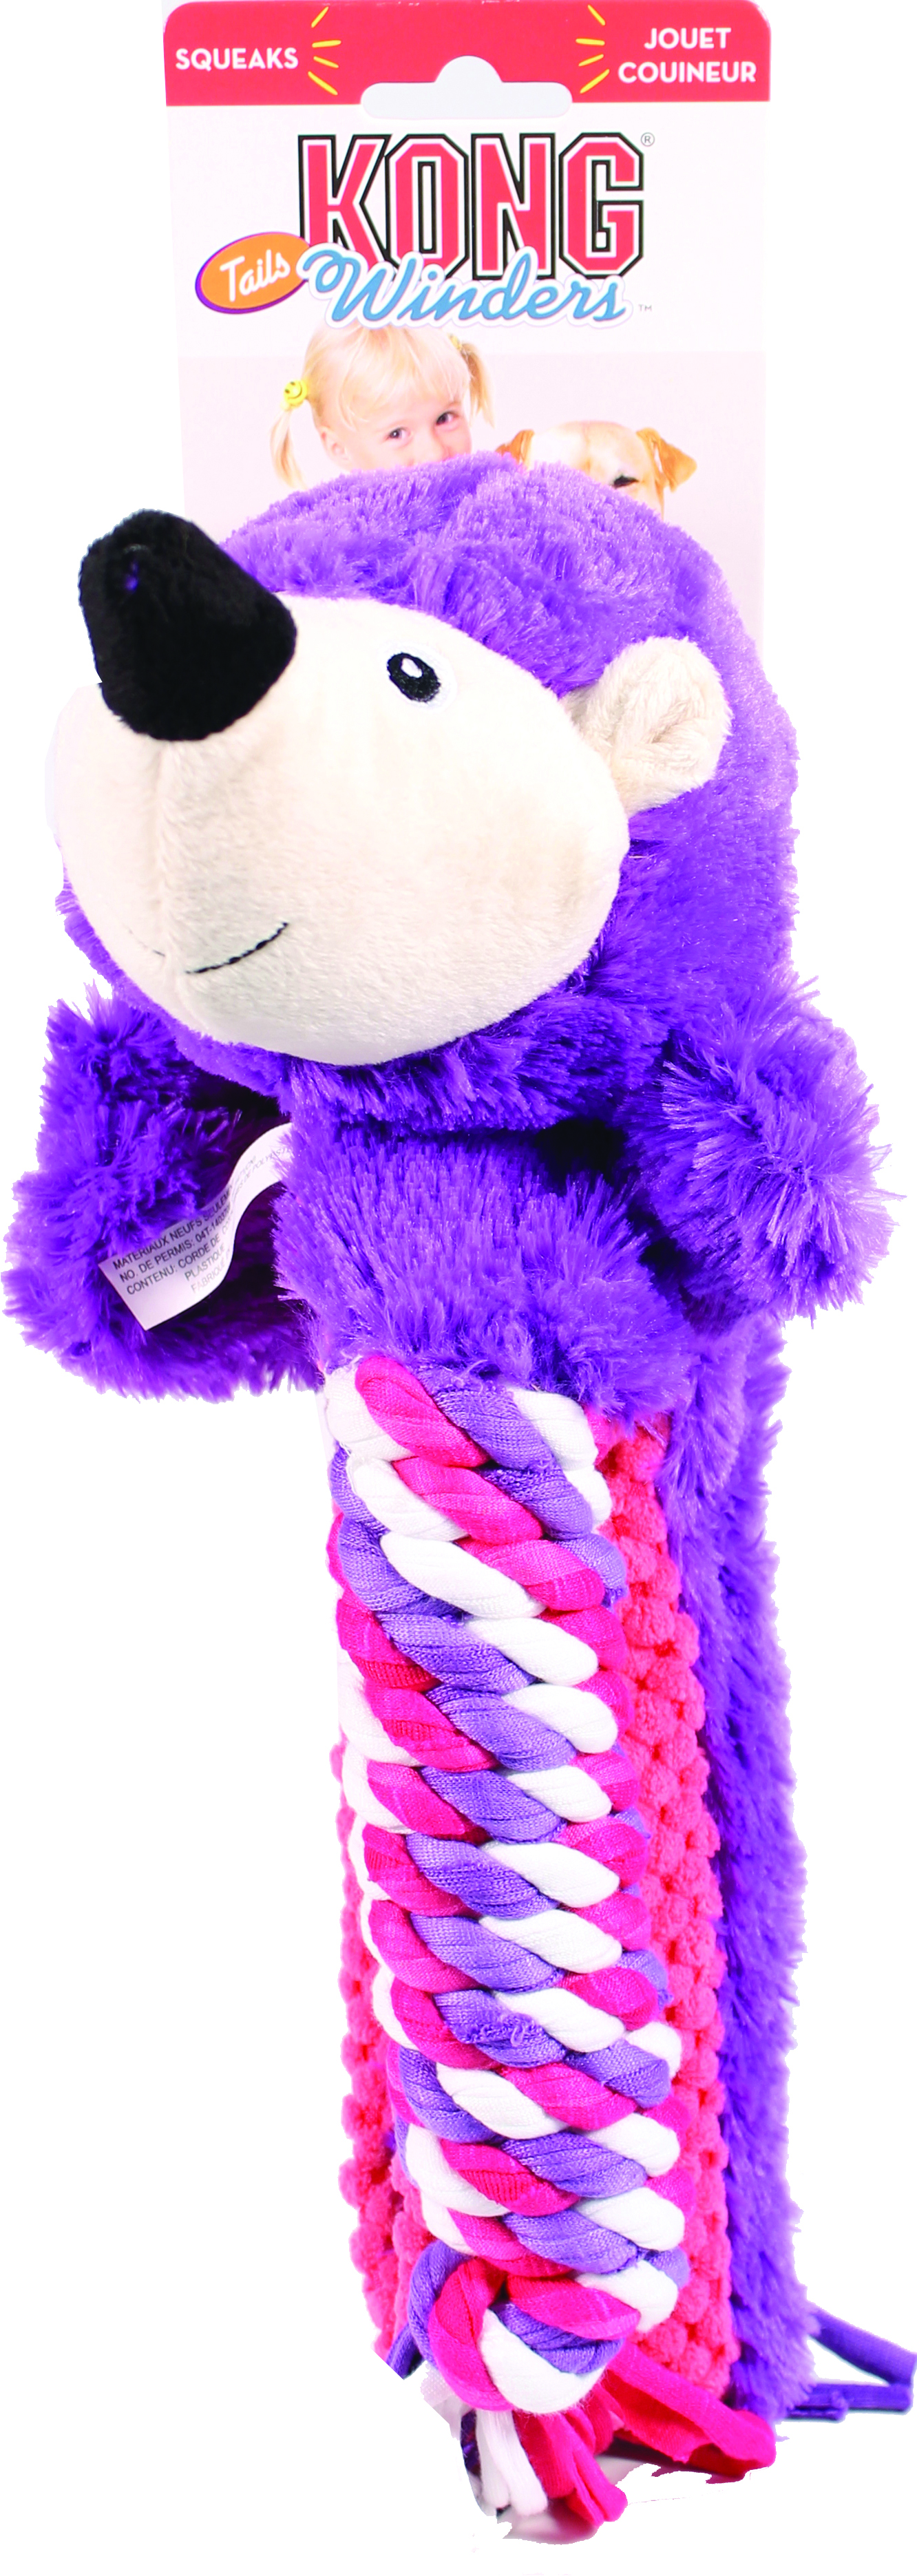 KONG Winders Tails Hedgehog Dog Toy